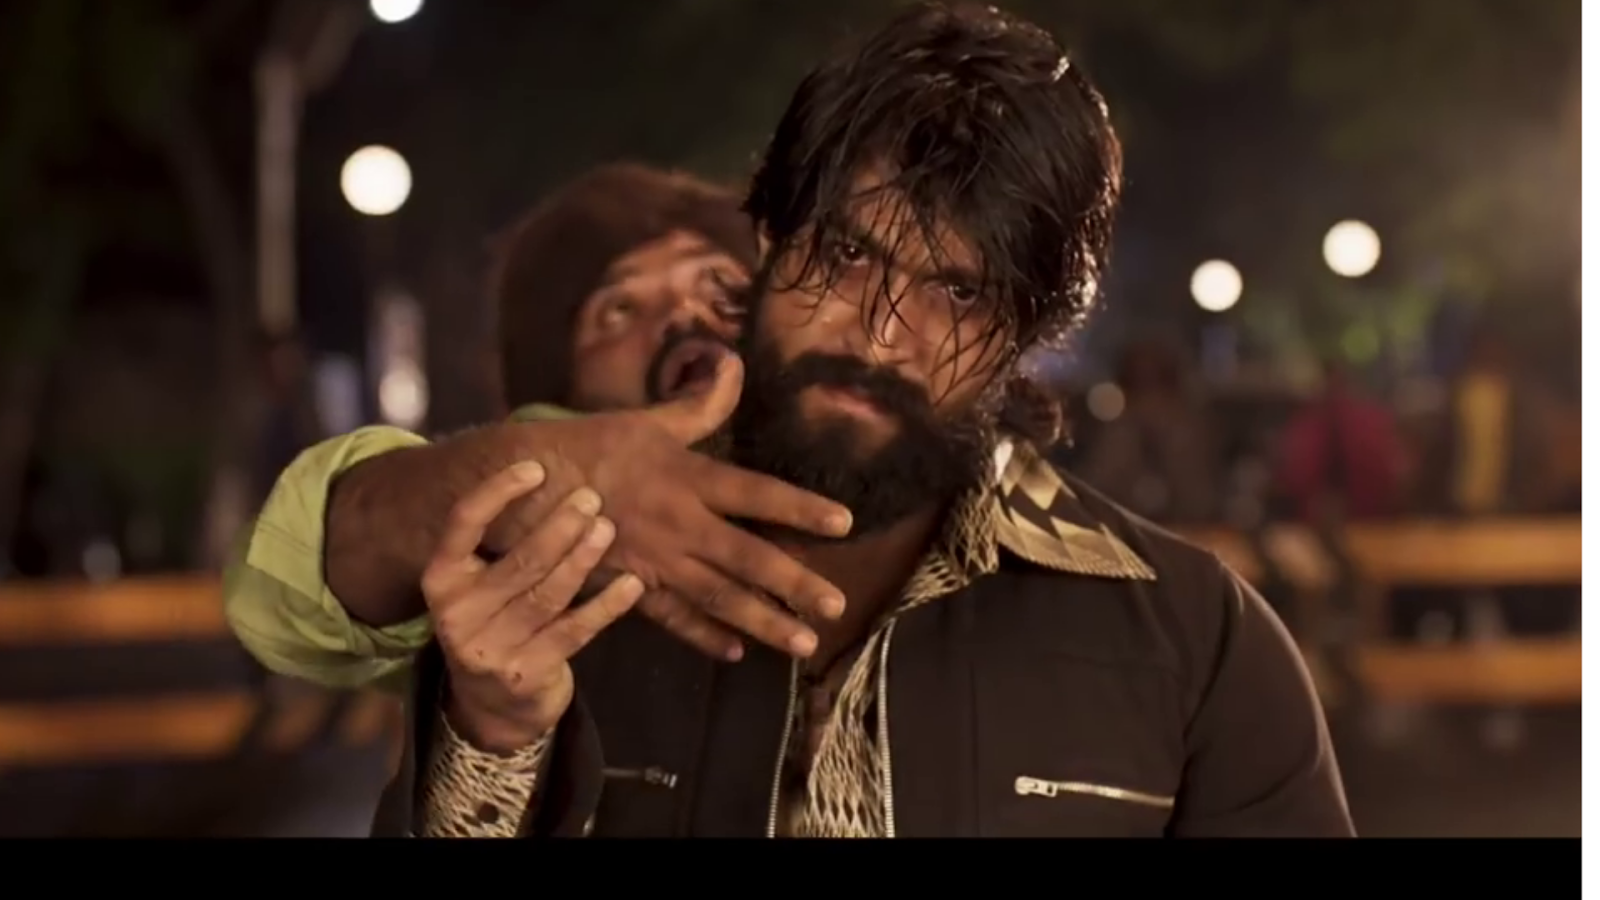 Kgf 2018 Full Movie In Hindi Free Download Mp4moviez Mp4moviez Hd